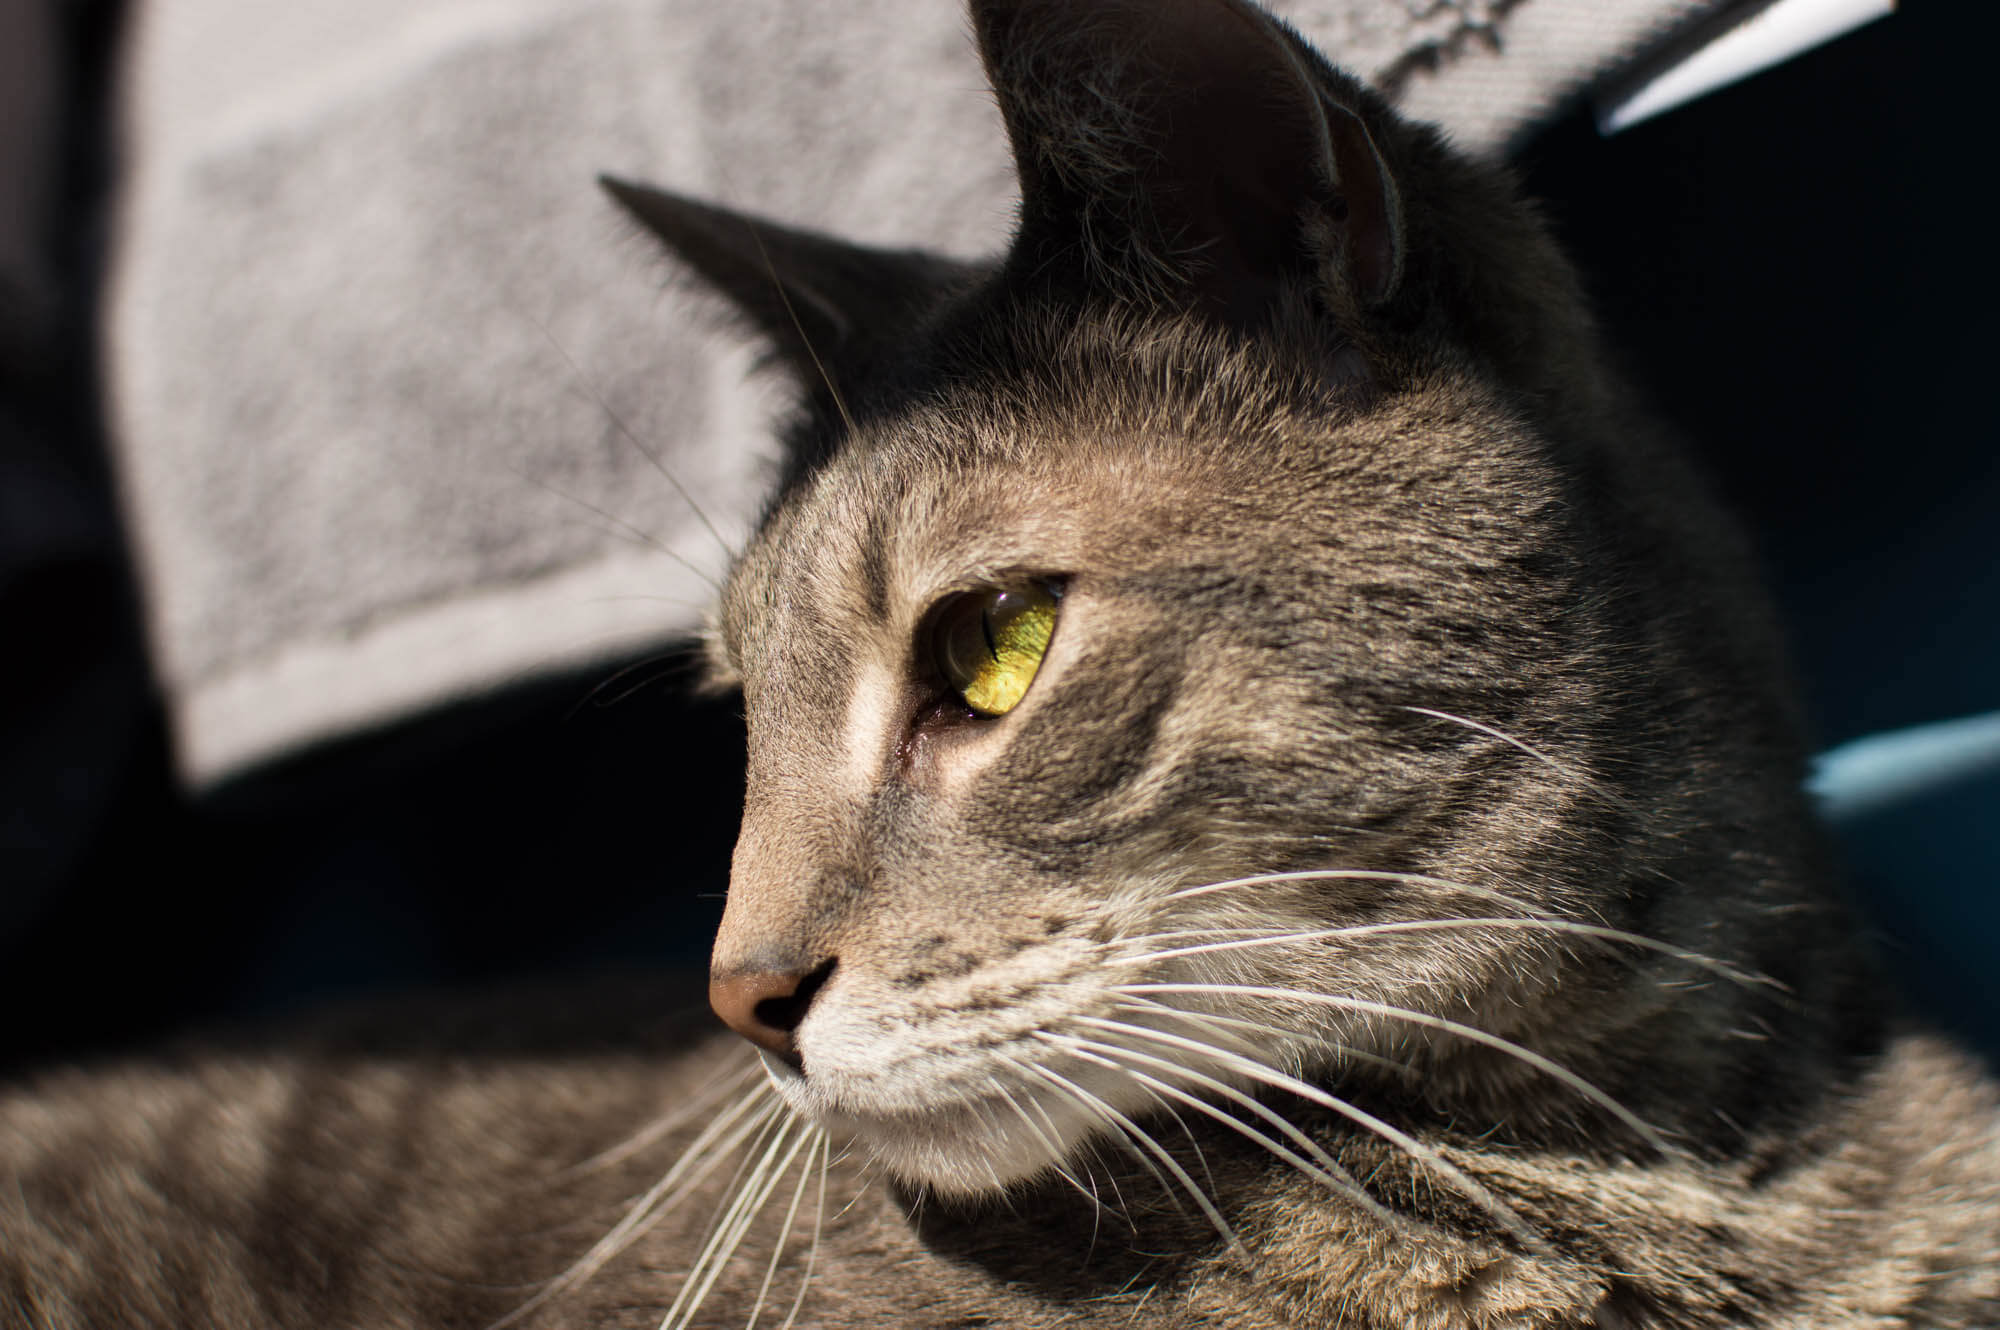 Joe's cat Cas